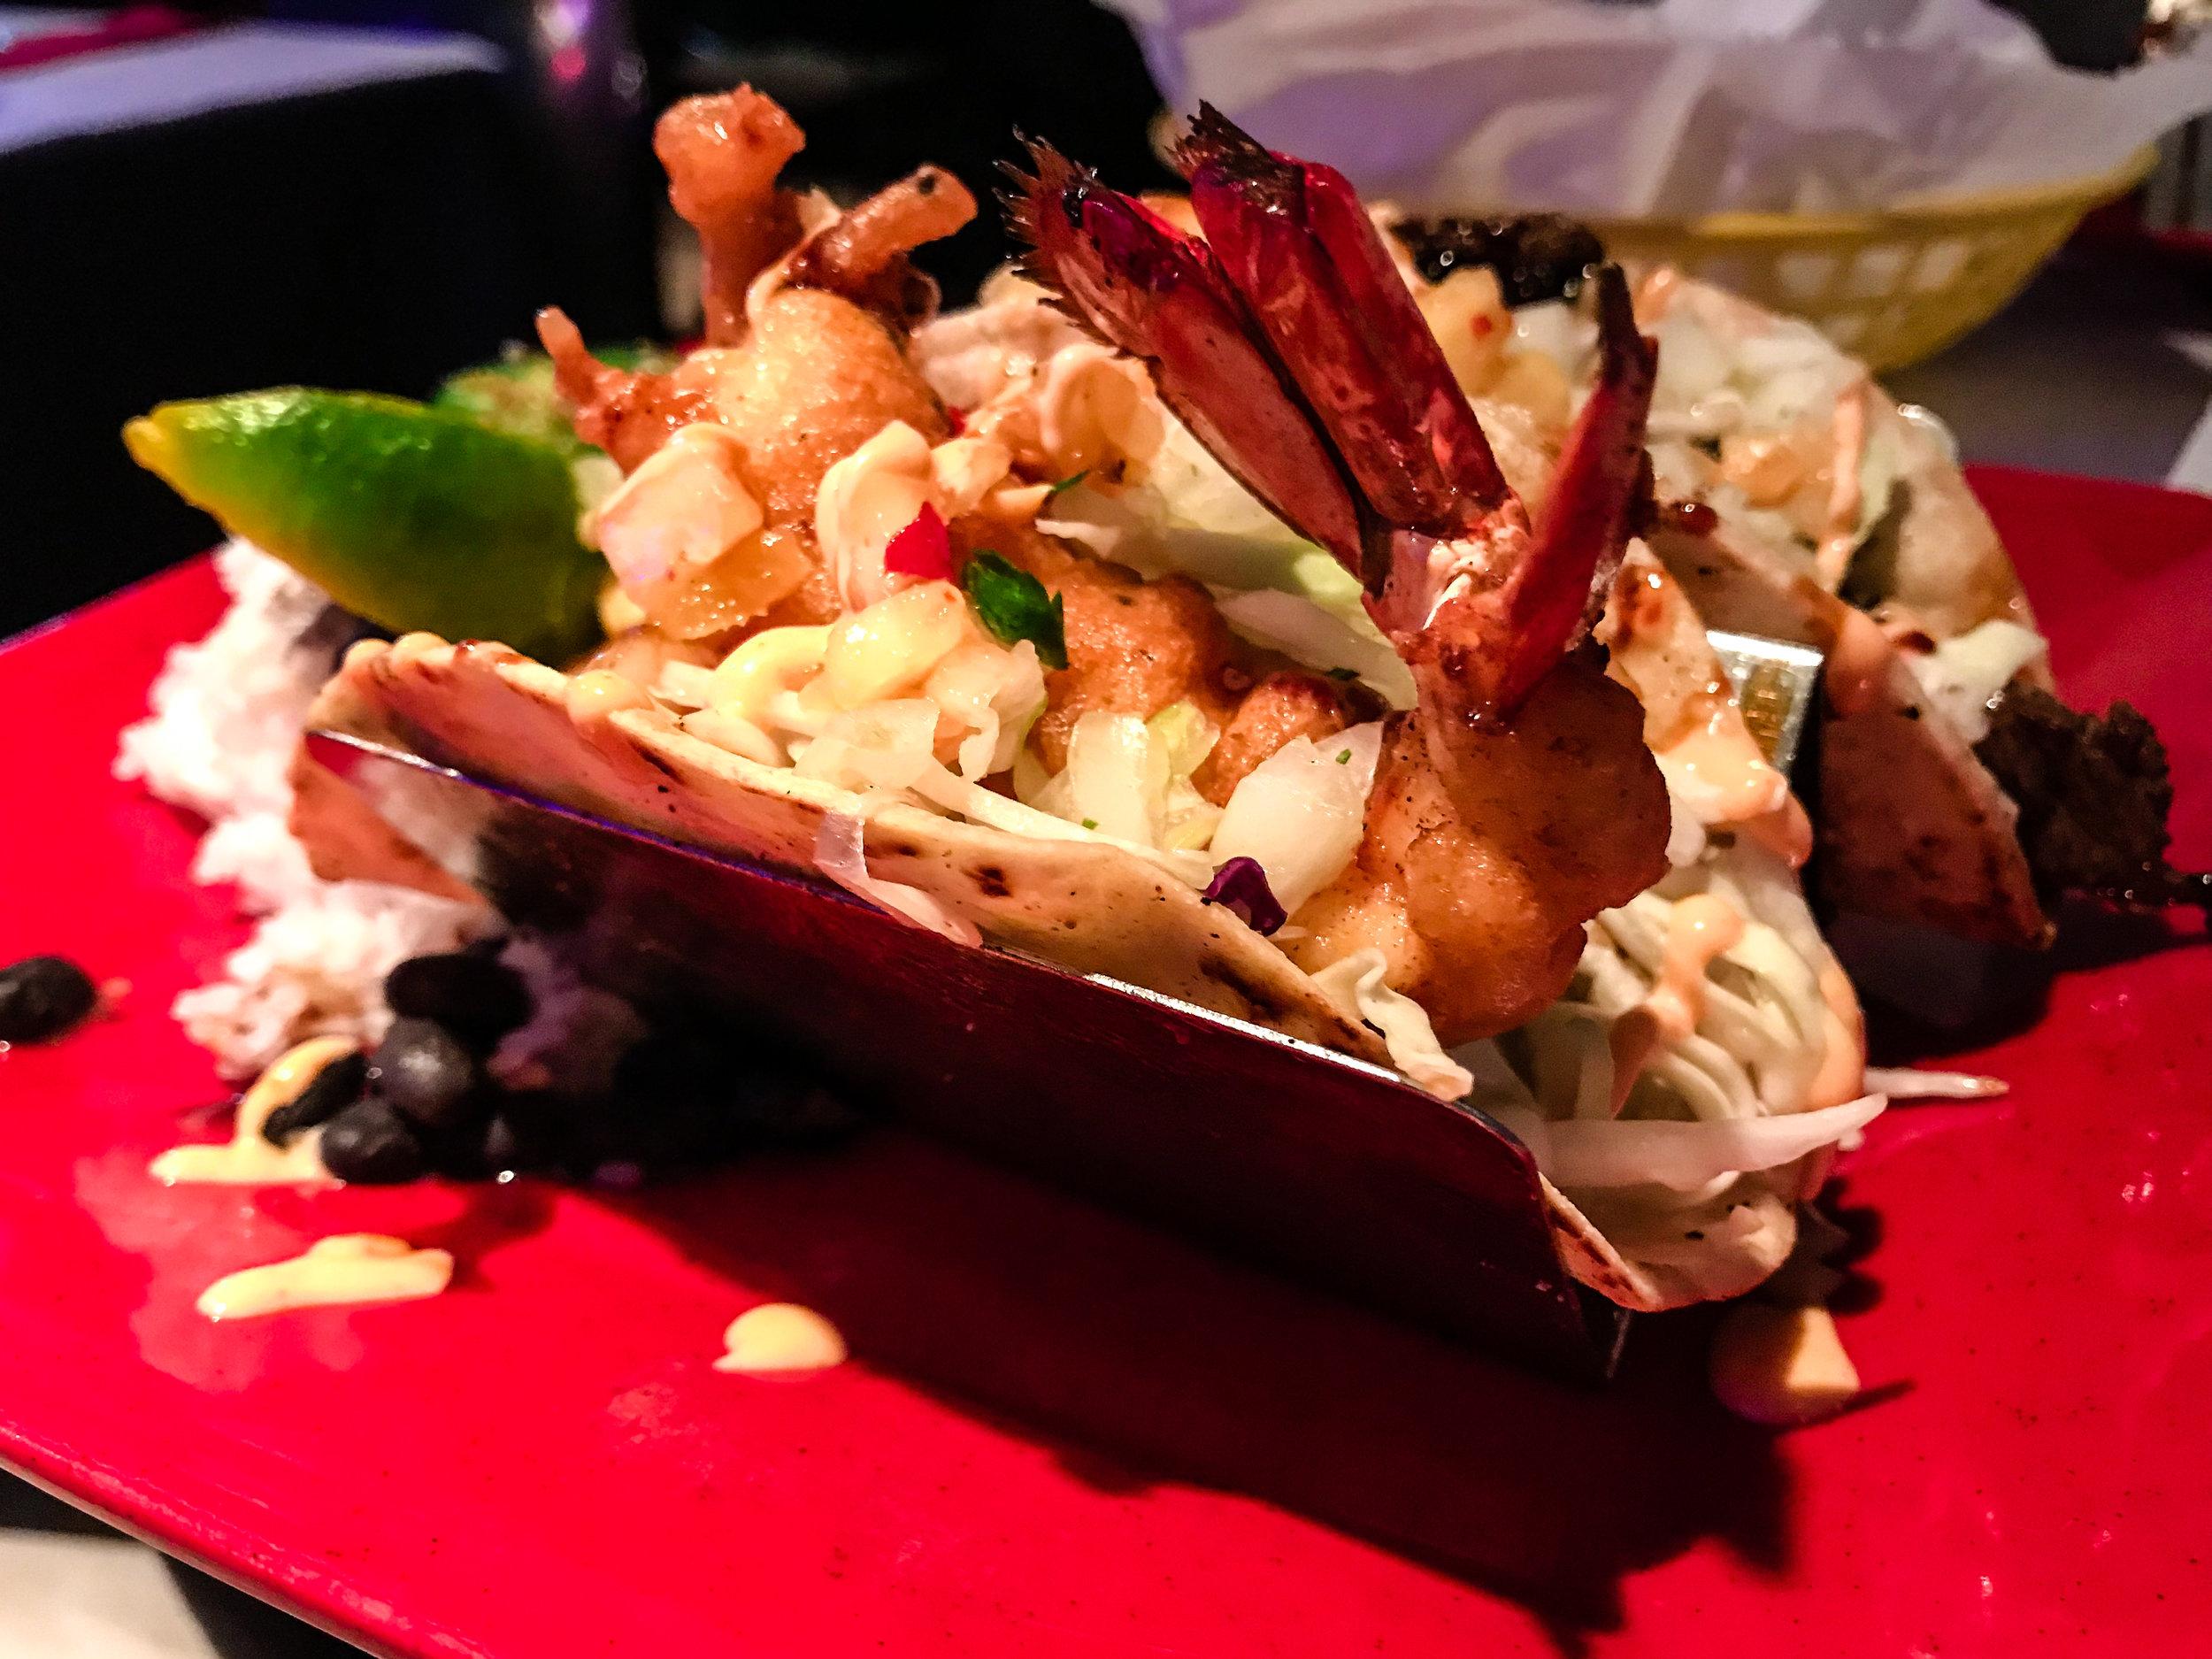 Pepe Osaka's Tacos